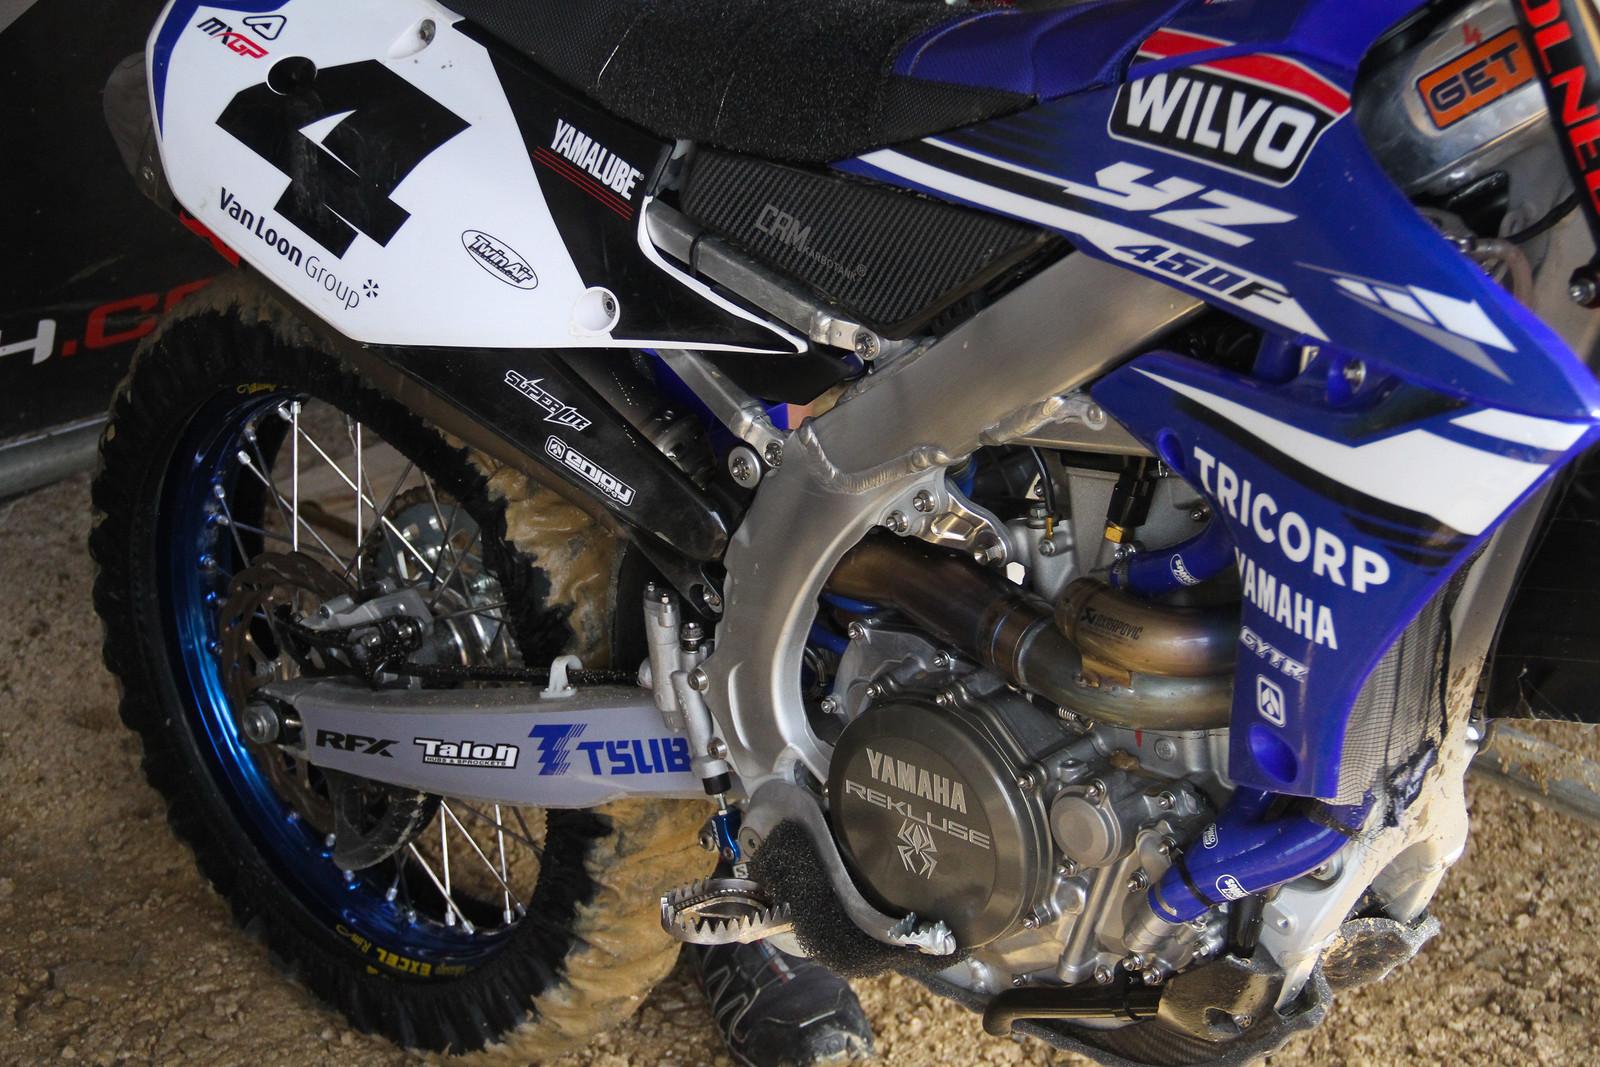 Arnaud Tonus' Bike - ayearinmx - Motocross Pictures - Vital MX